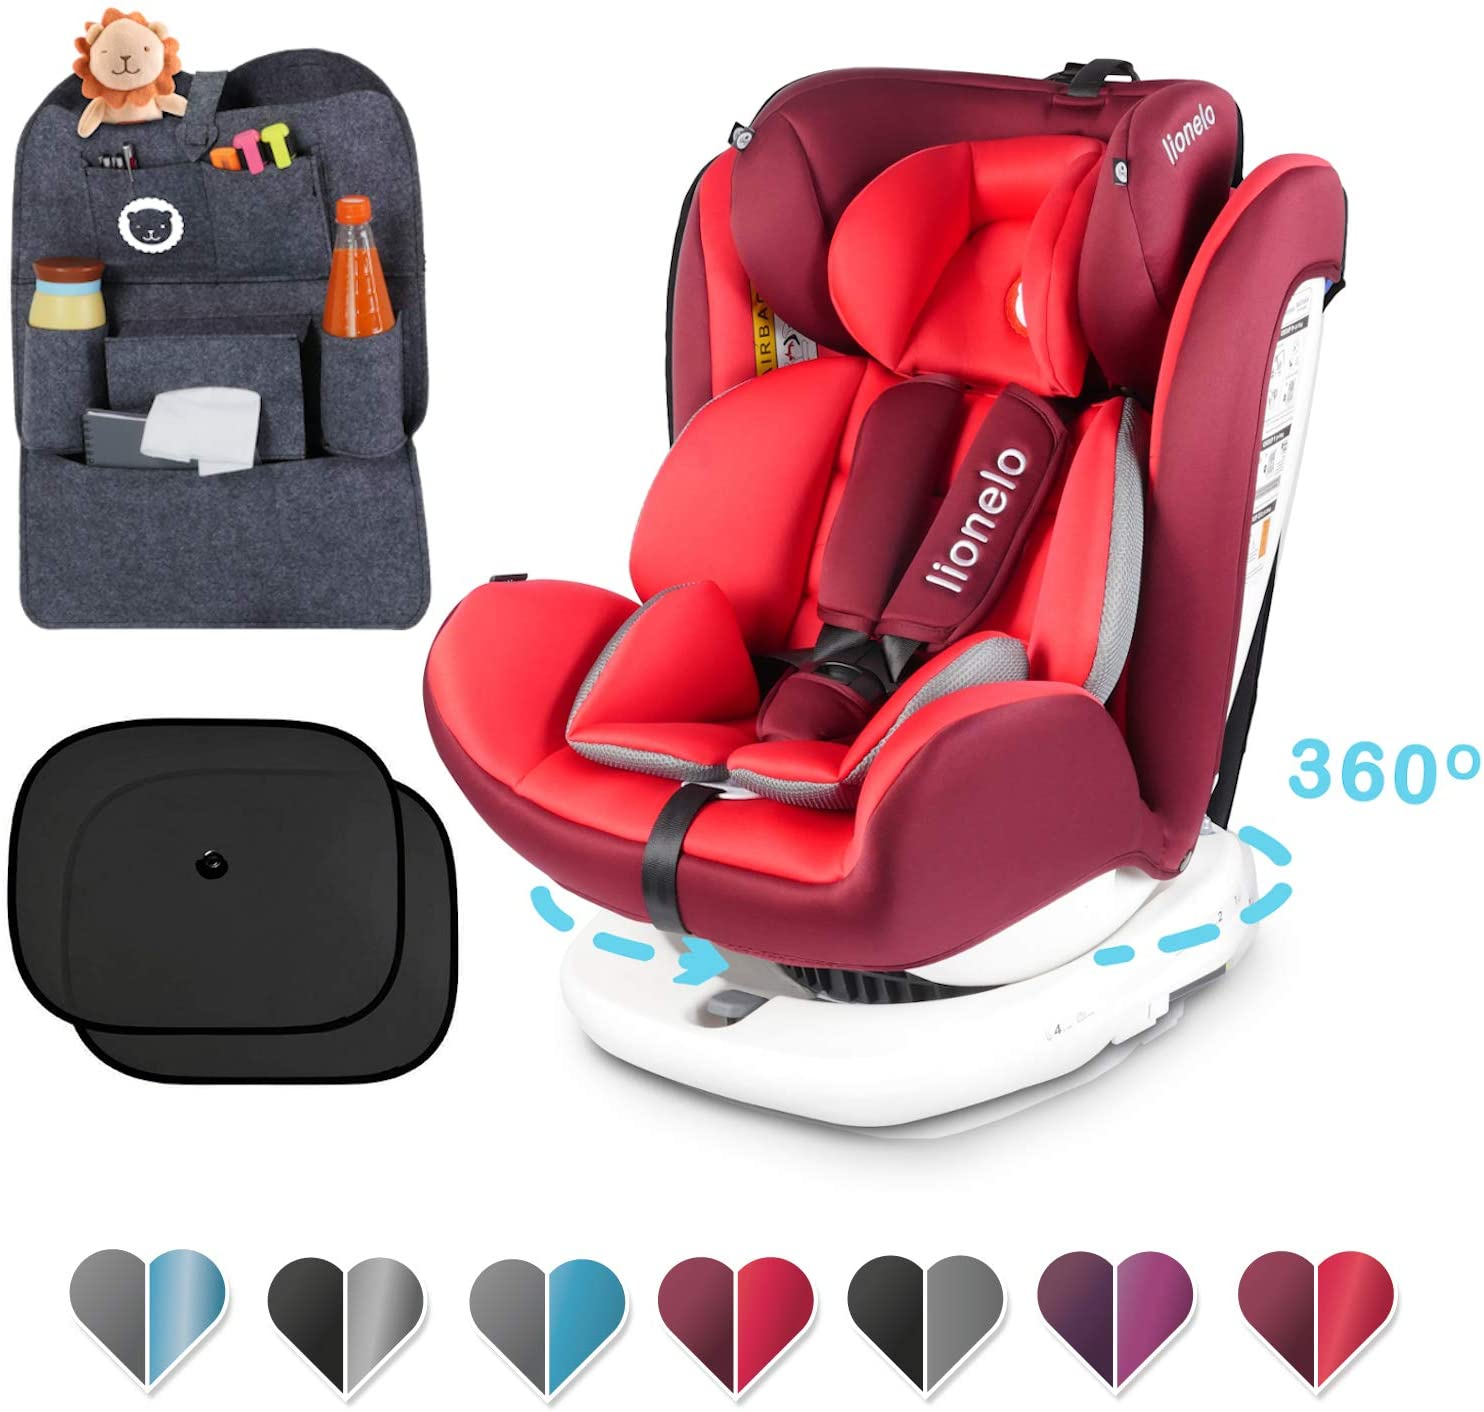 Lionelo Bastiaan - Asiento infantil para coche (grupo 0+ 1 2 3 (0-36 kg), ISOFIX 360°, certificado TÜV SÜD, ECE R 44/04) rojo Rojo + Set